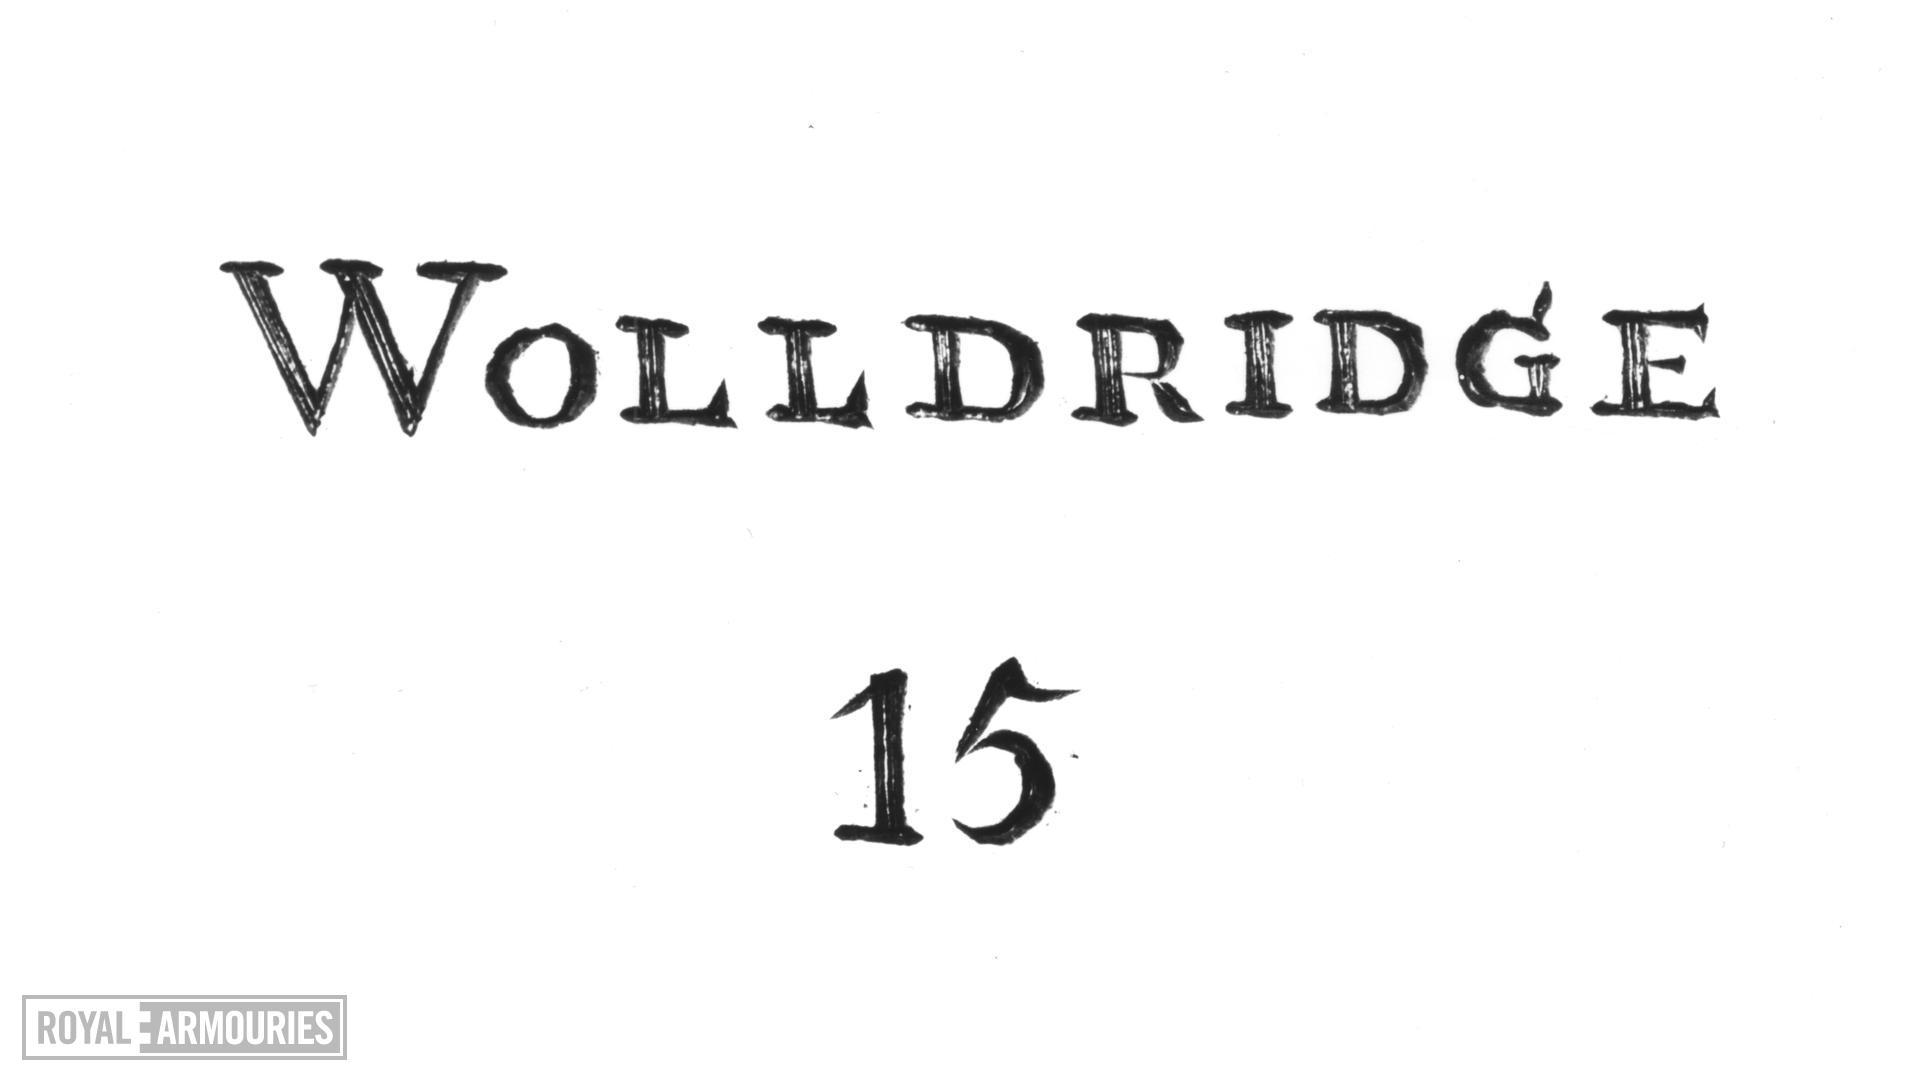 Flintlock muzzle-loading military musketoon - Pattern 1704 Sea Service By Wolldridge